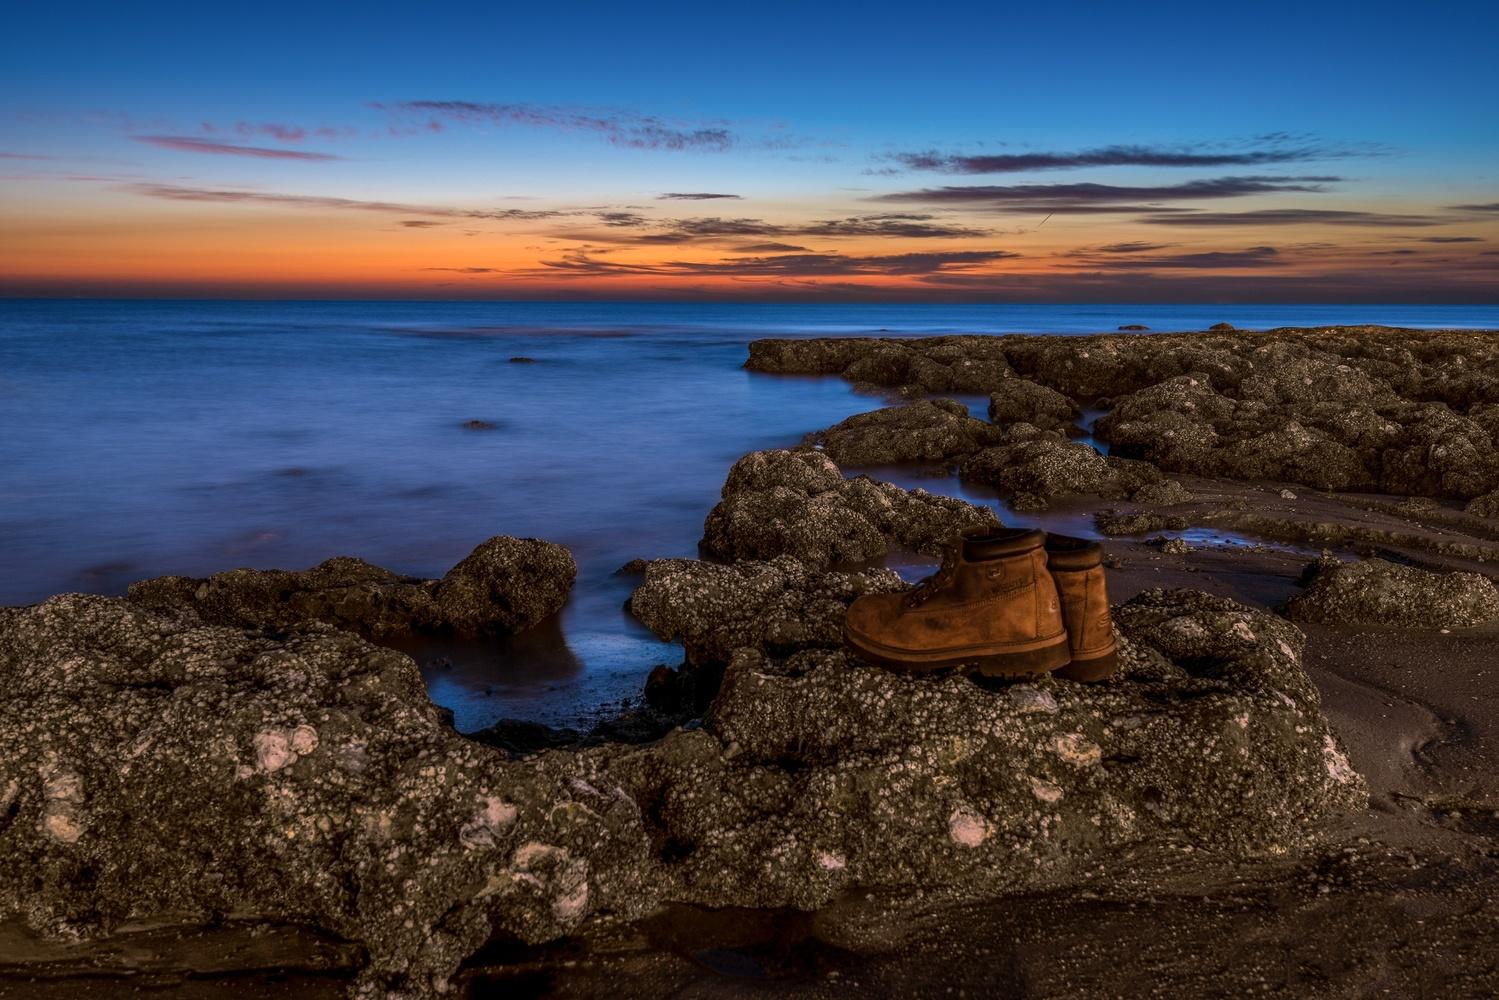 Lost at sea  by Muhammad Al-Qatam